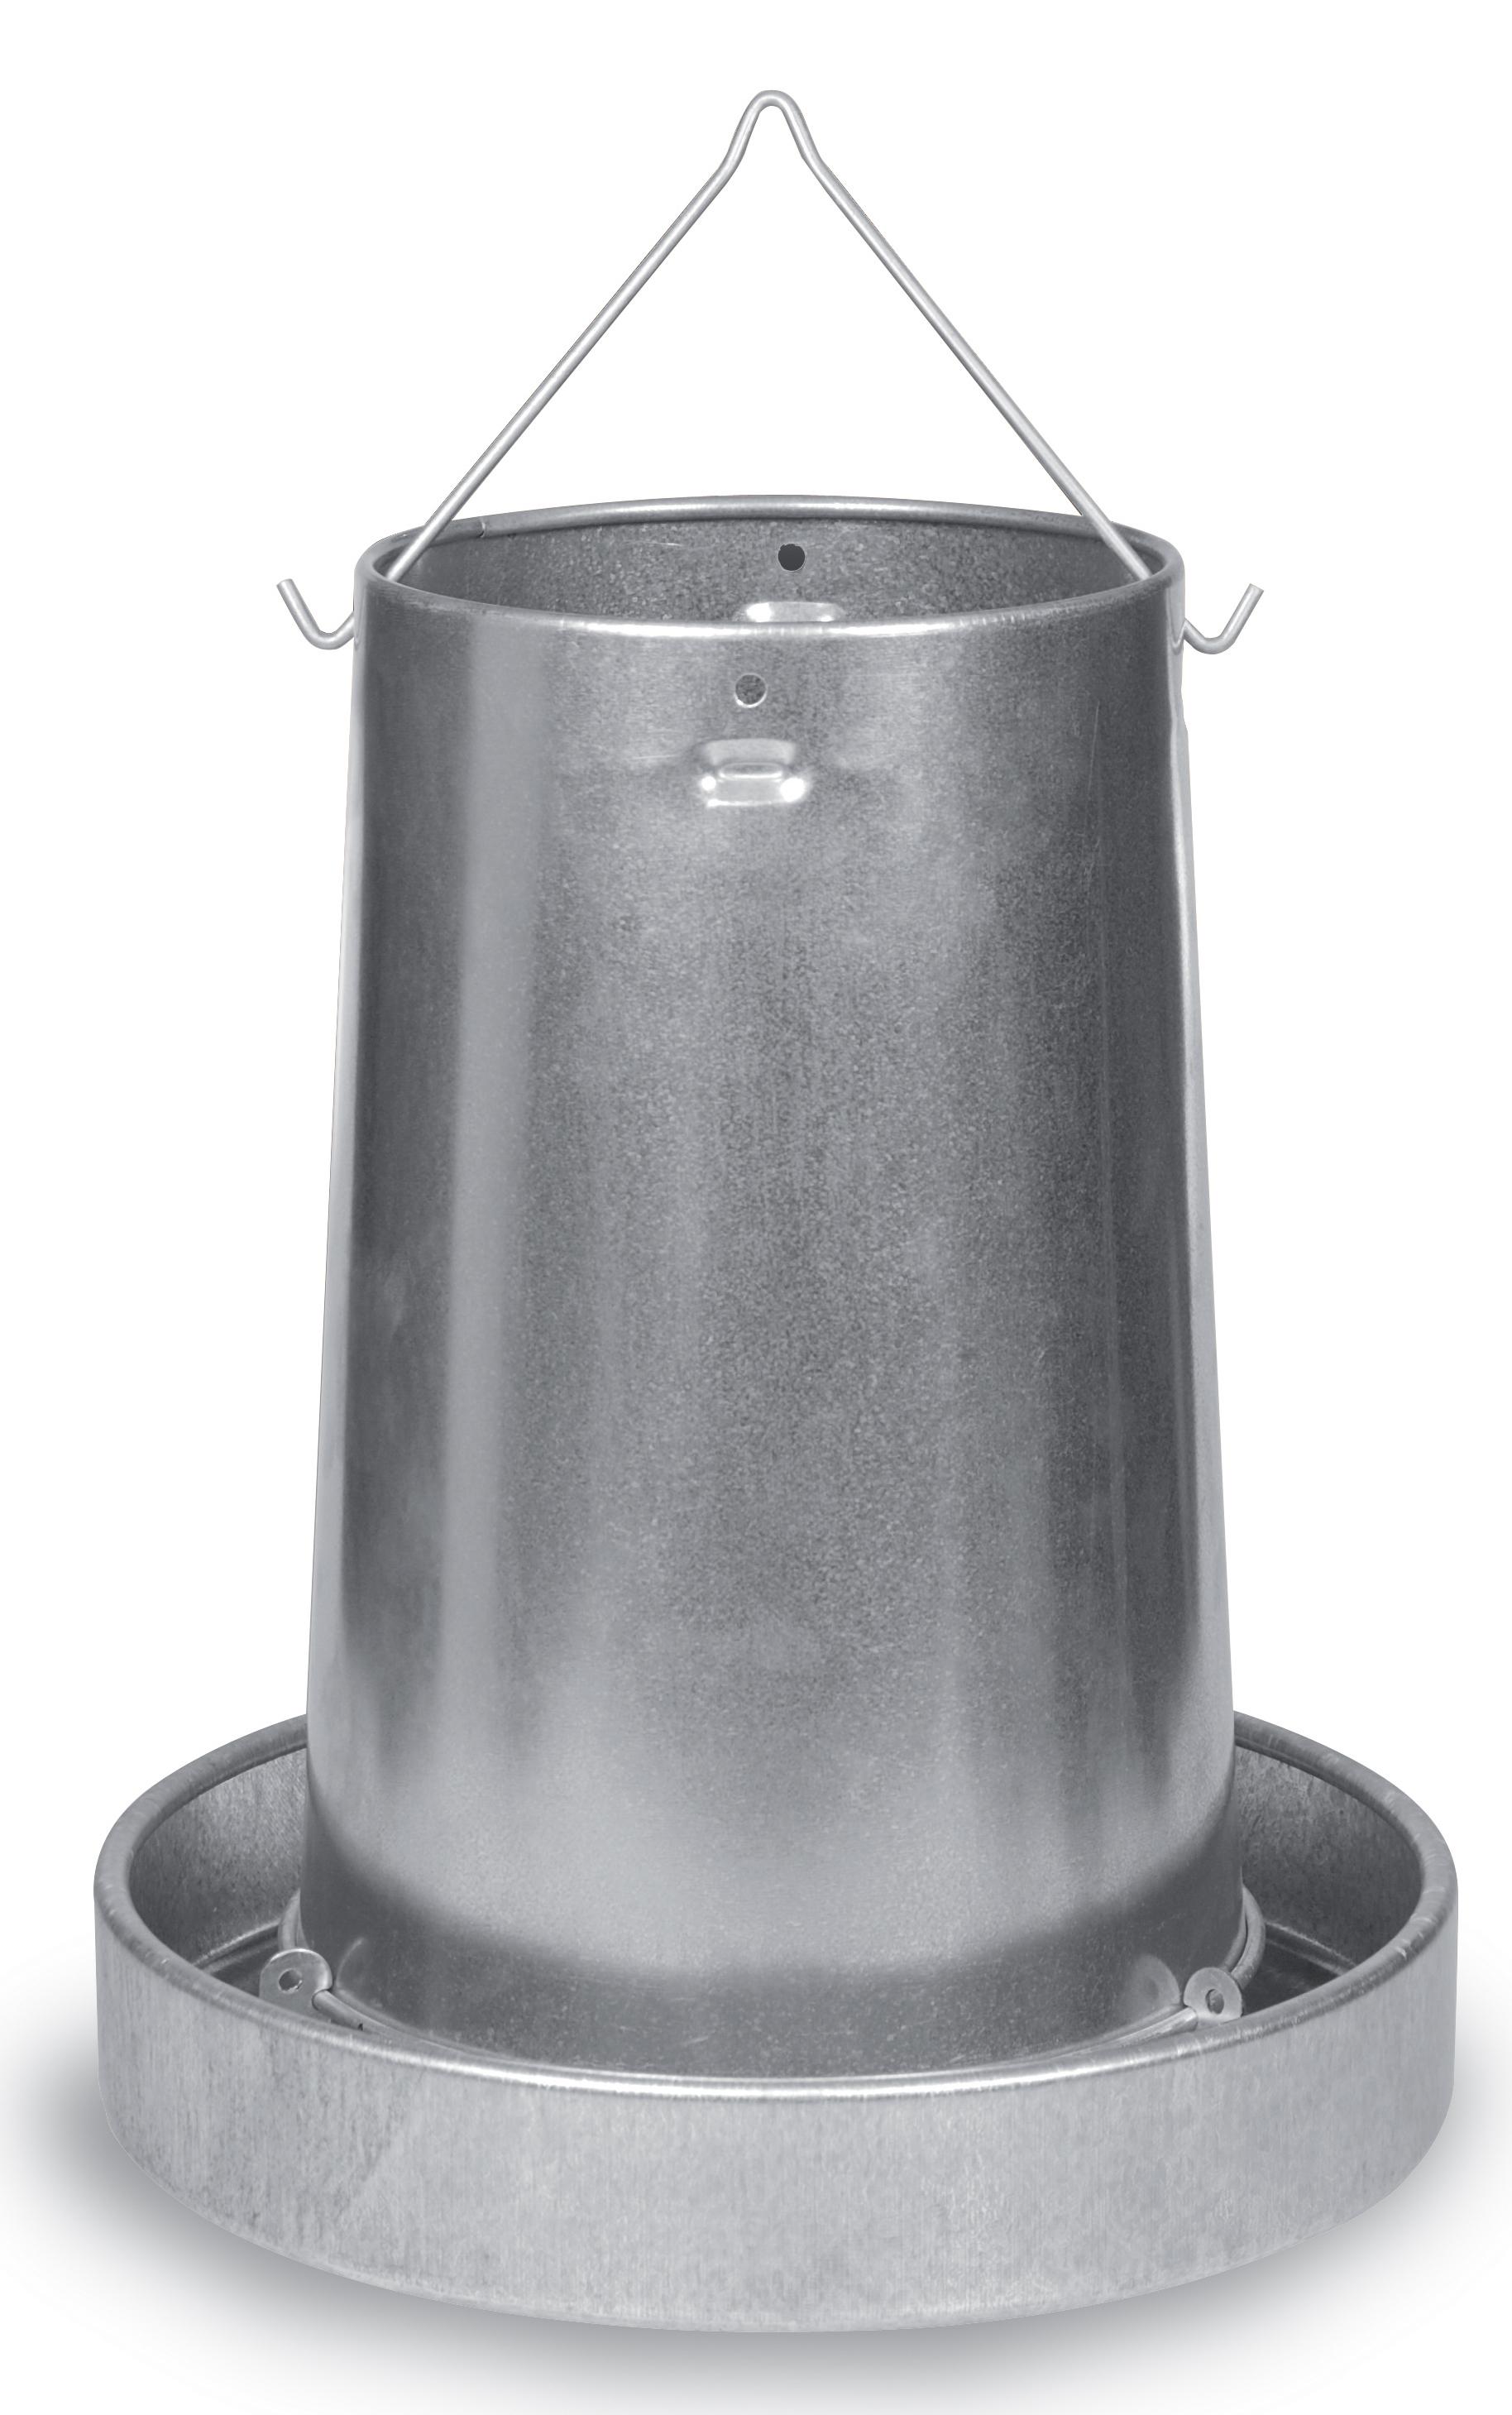 Кормушка бункерная для кур Gaun 20